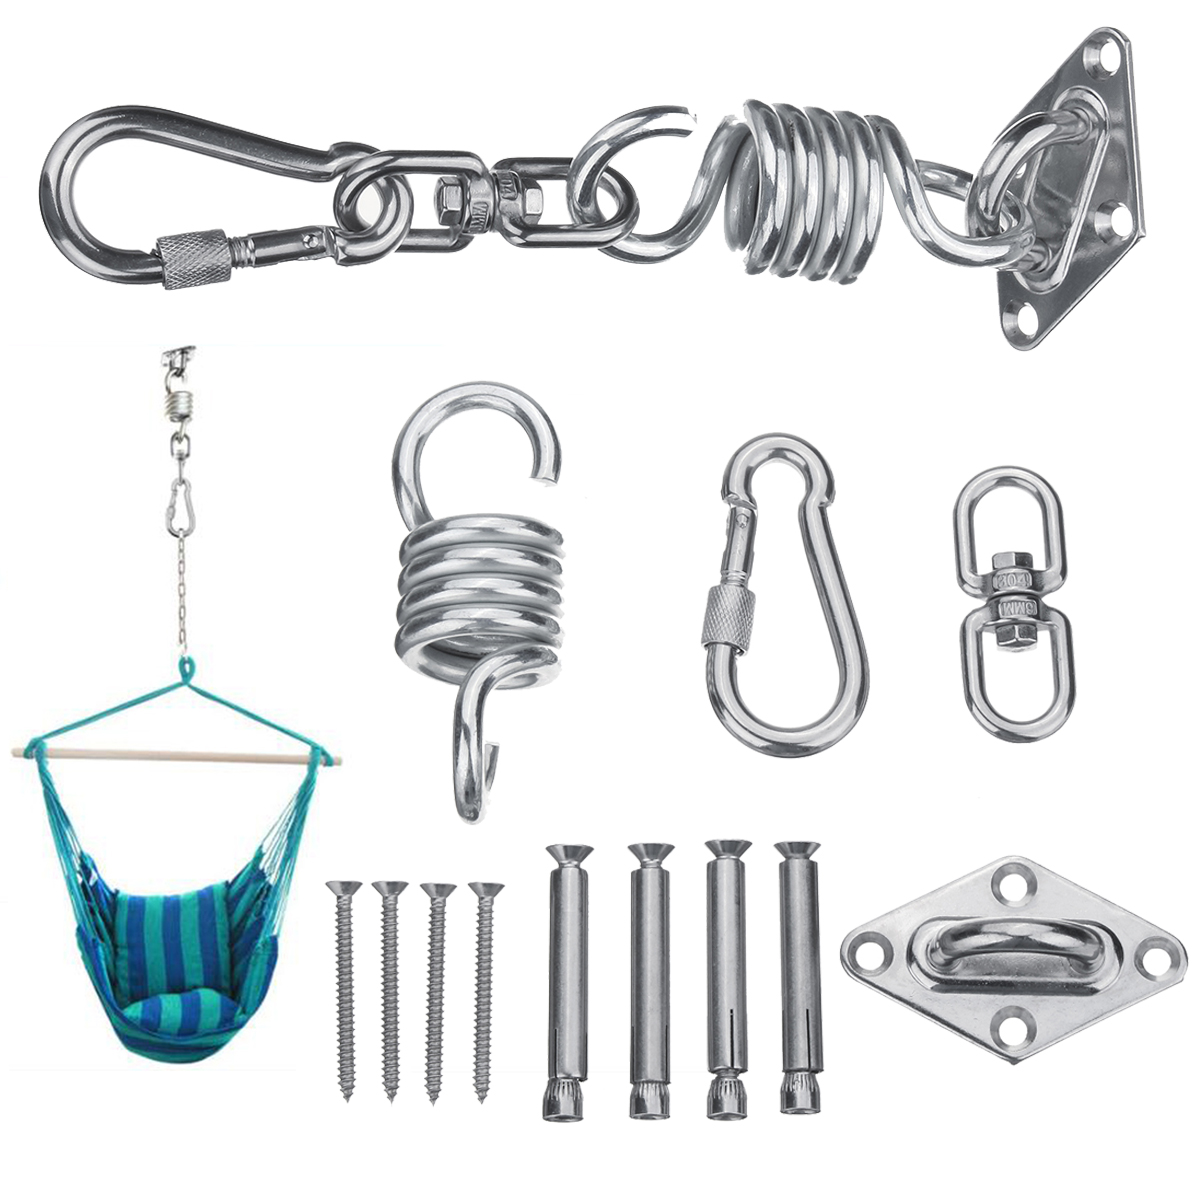 Stainless Steel Hammock Chair Hanging Kit Ceiling Mount Spring Swivel Snap Hook Accessories Sale